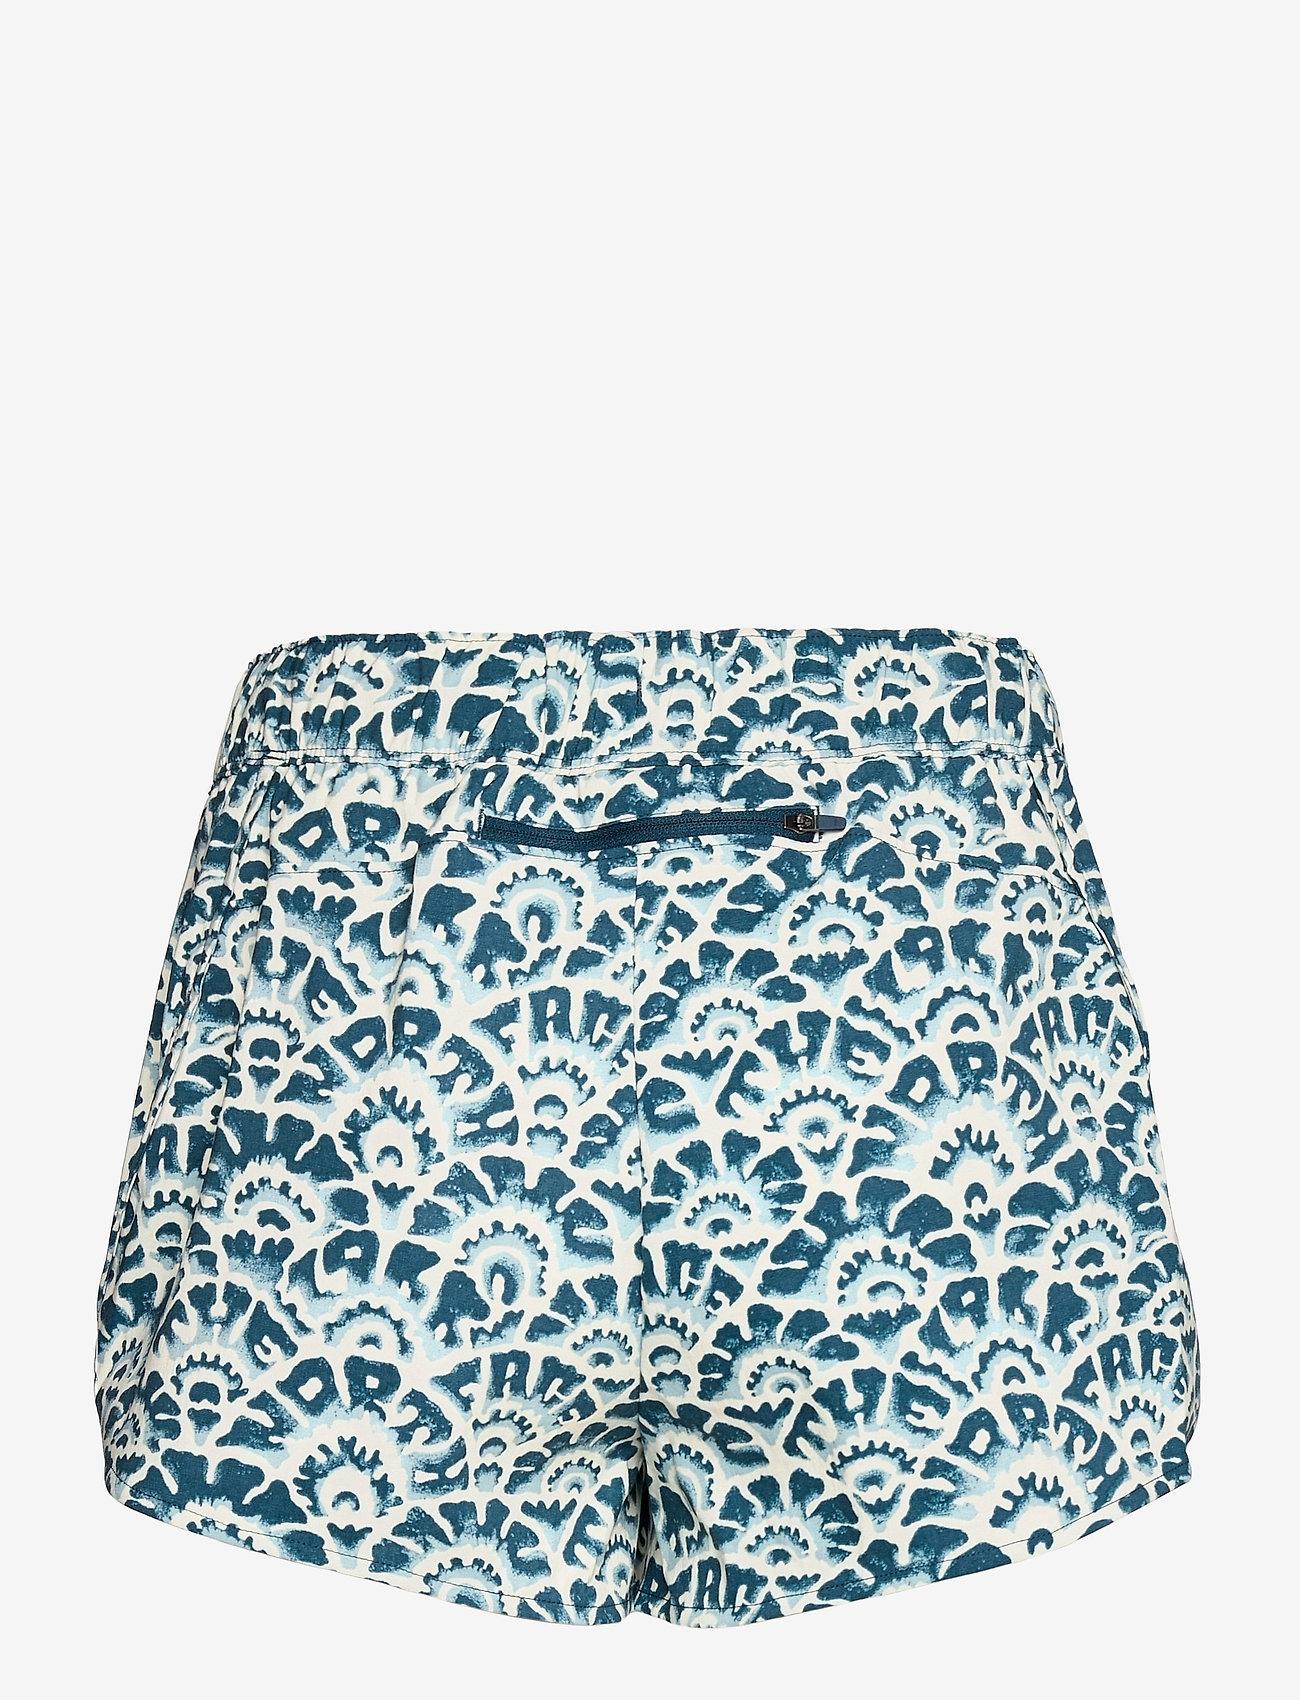 The North Face - W CLASS V MINI SHORT - wandel korte broek - monterey blue ashbury floral print - 1